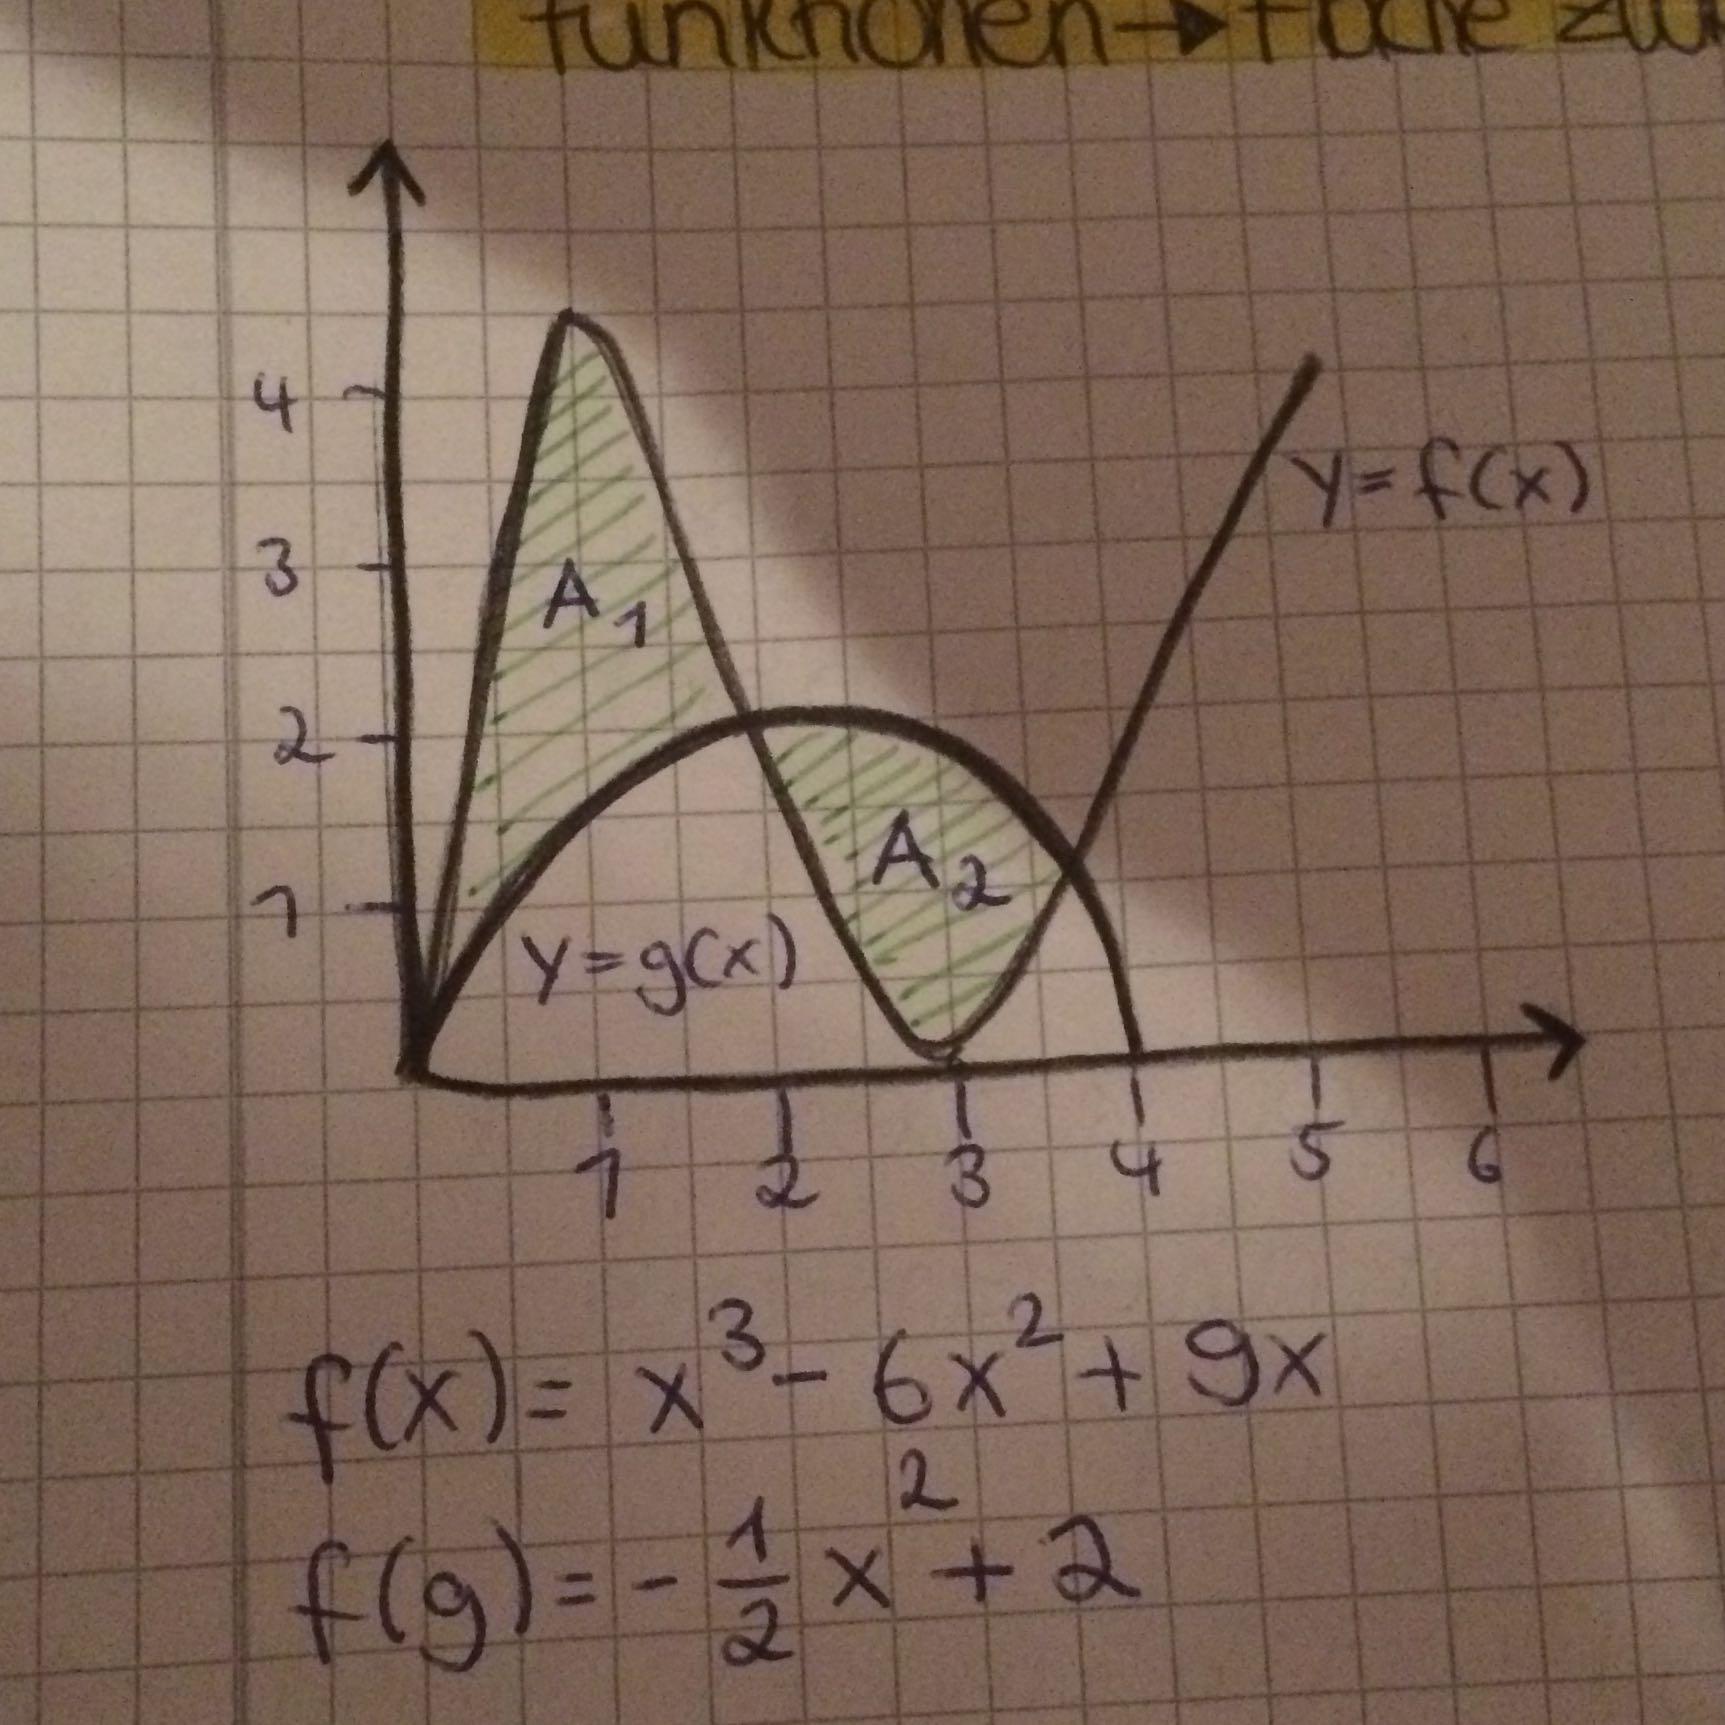 fläche zwischen zwei graphen berechnen? (schule, mathe, lernen)